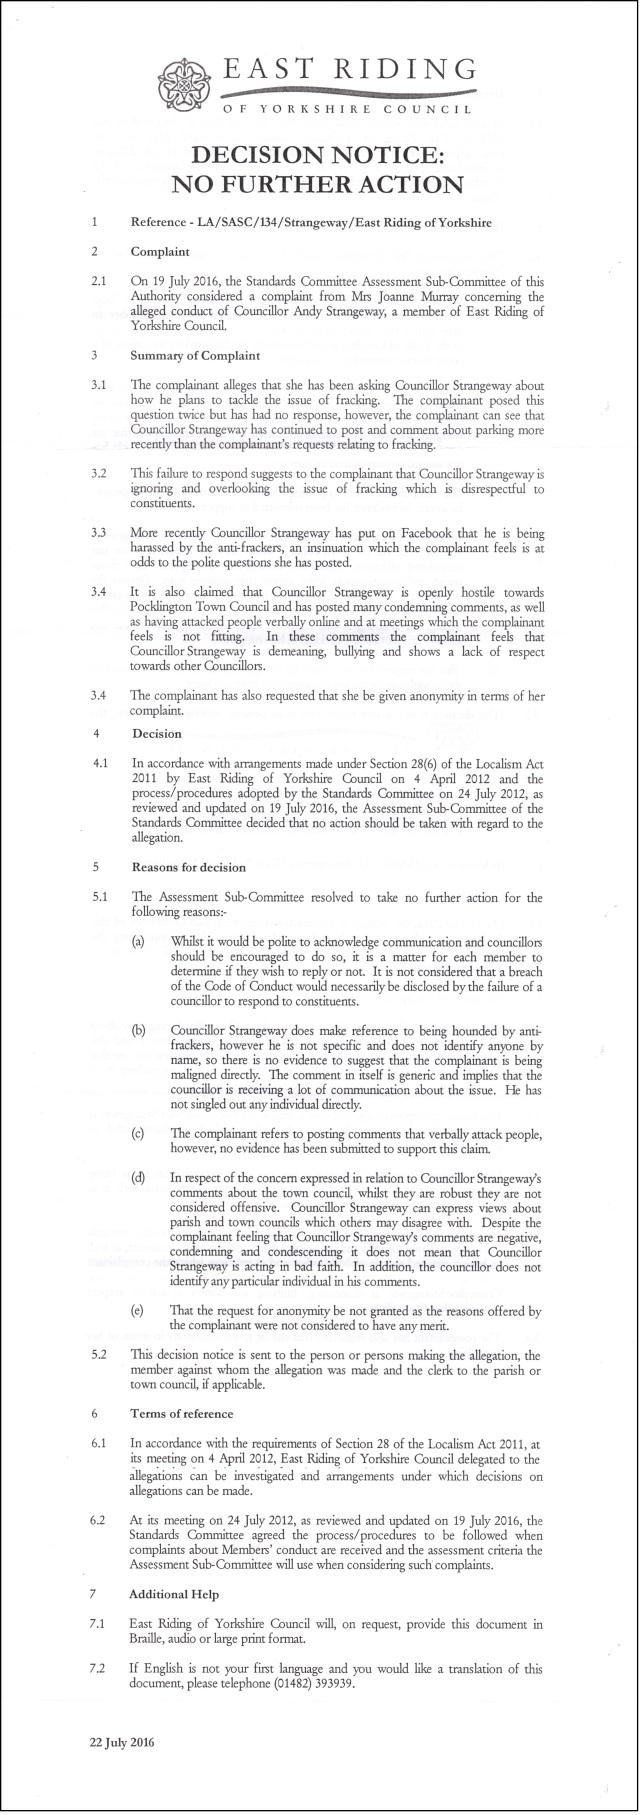 Joanne Murray Decision Notice (2)